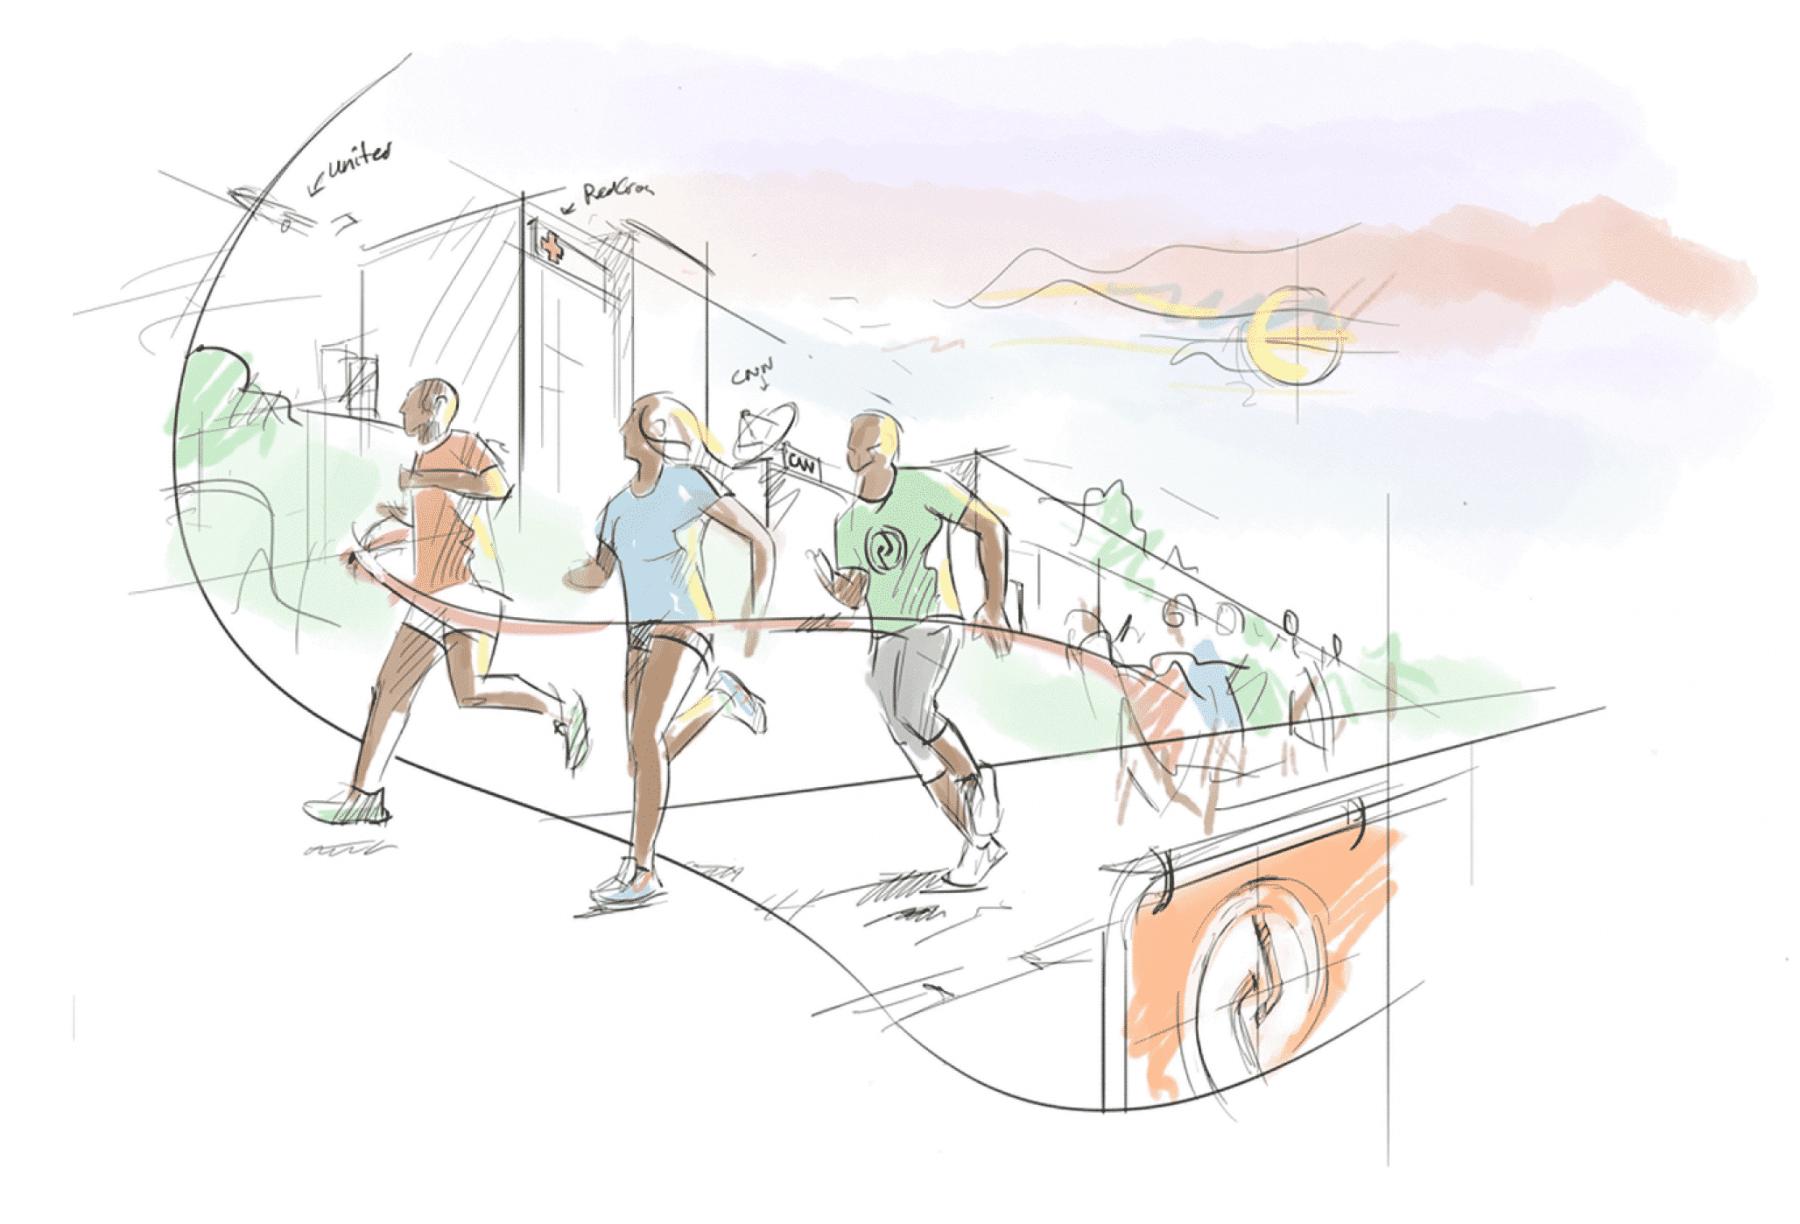 cr sketch people running